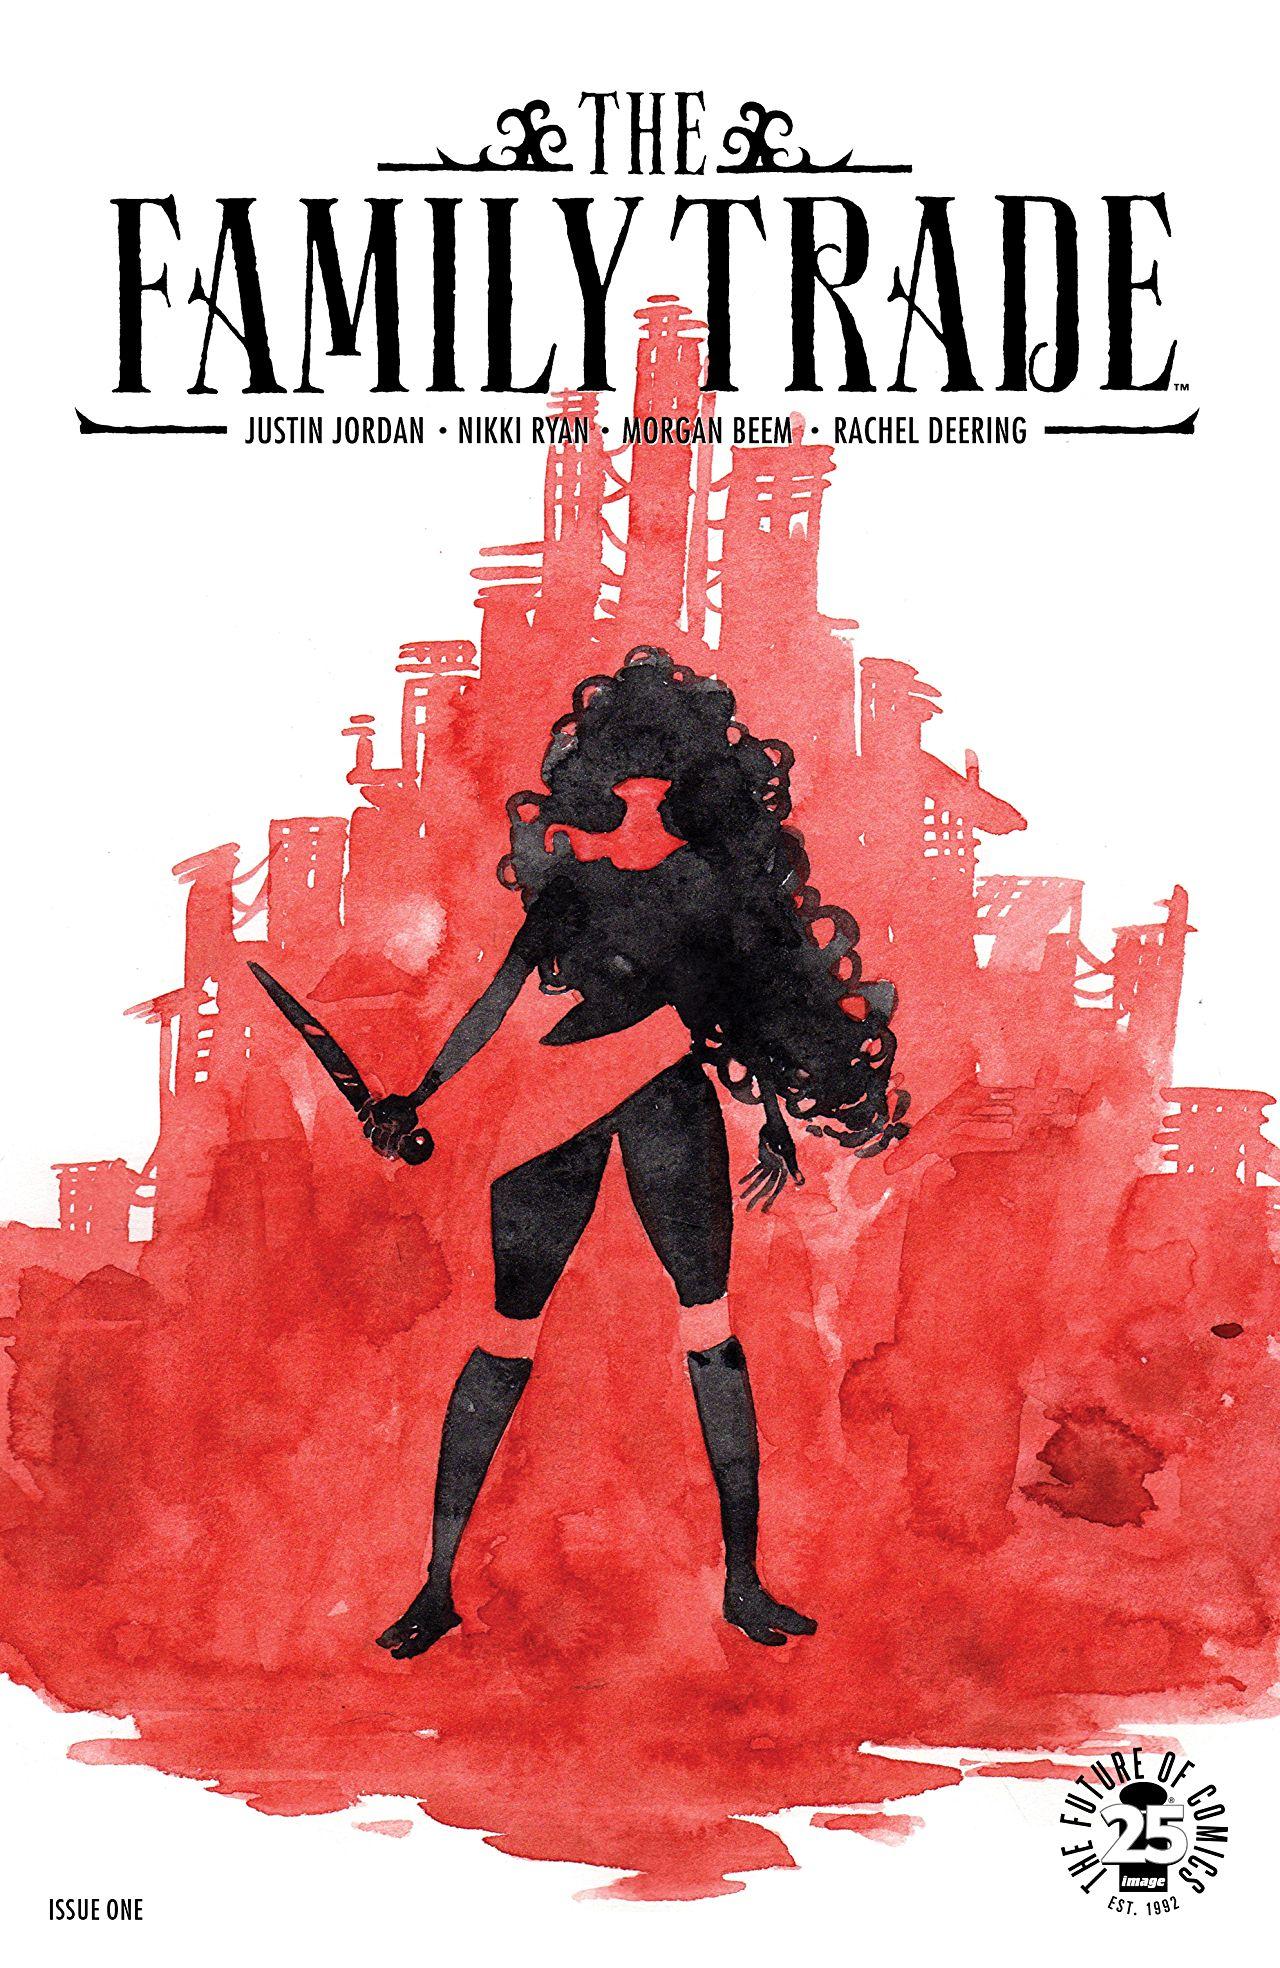 Family Trade #1 (Image Comics) digital comic free @ Comixology